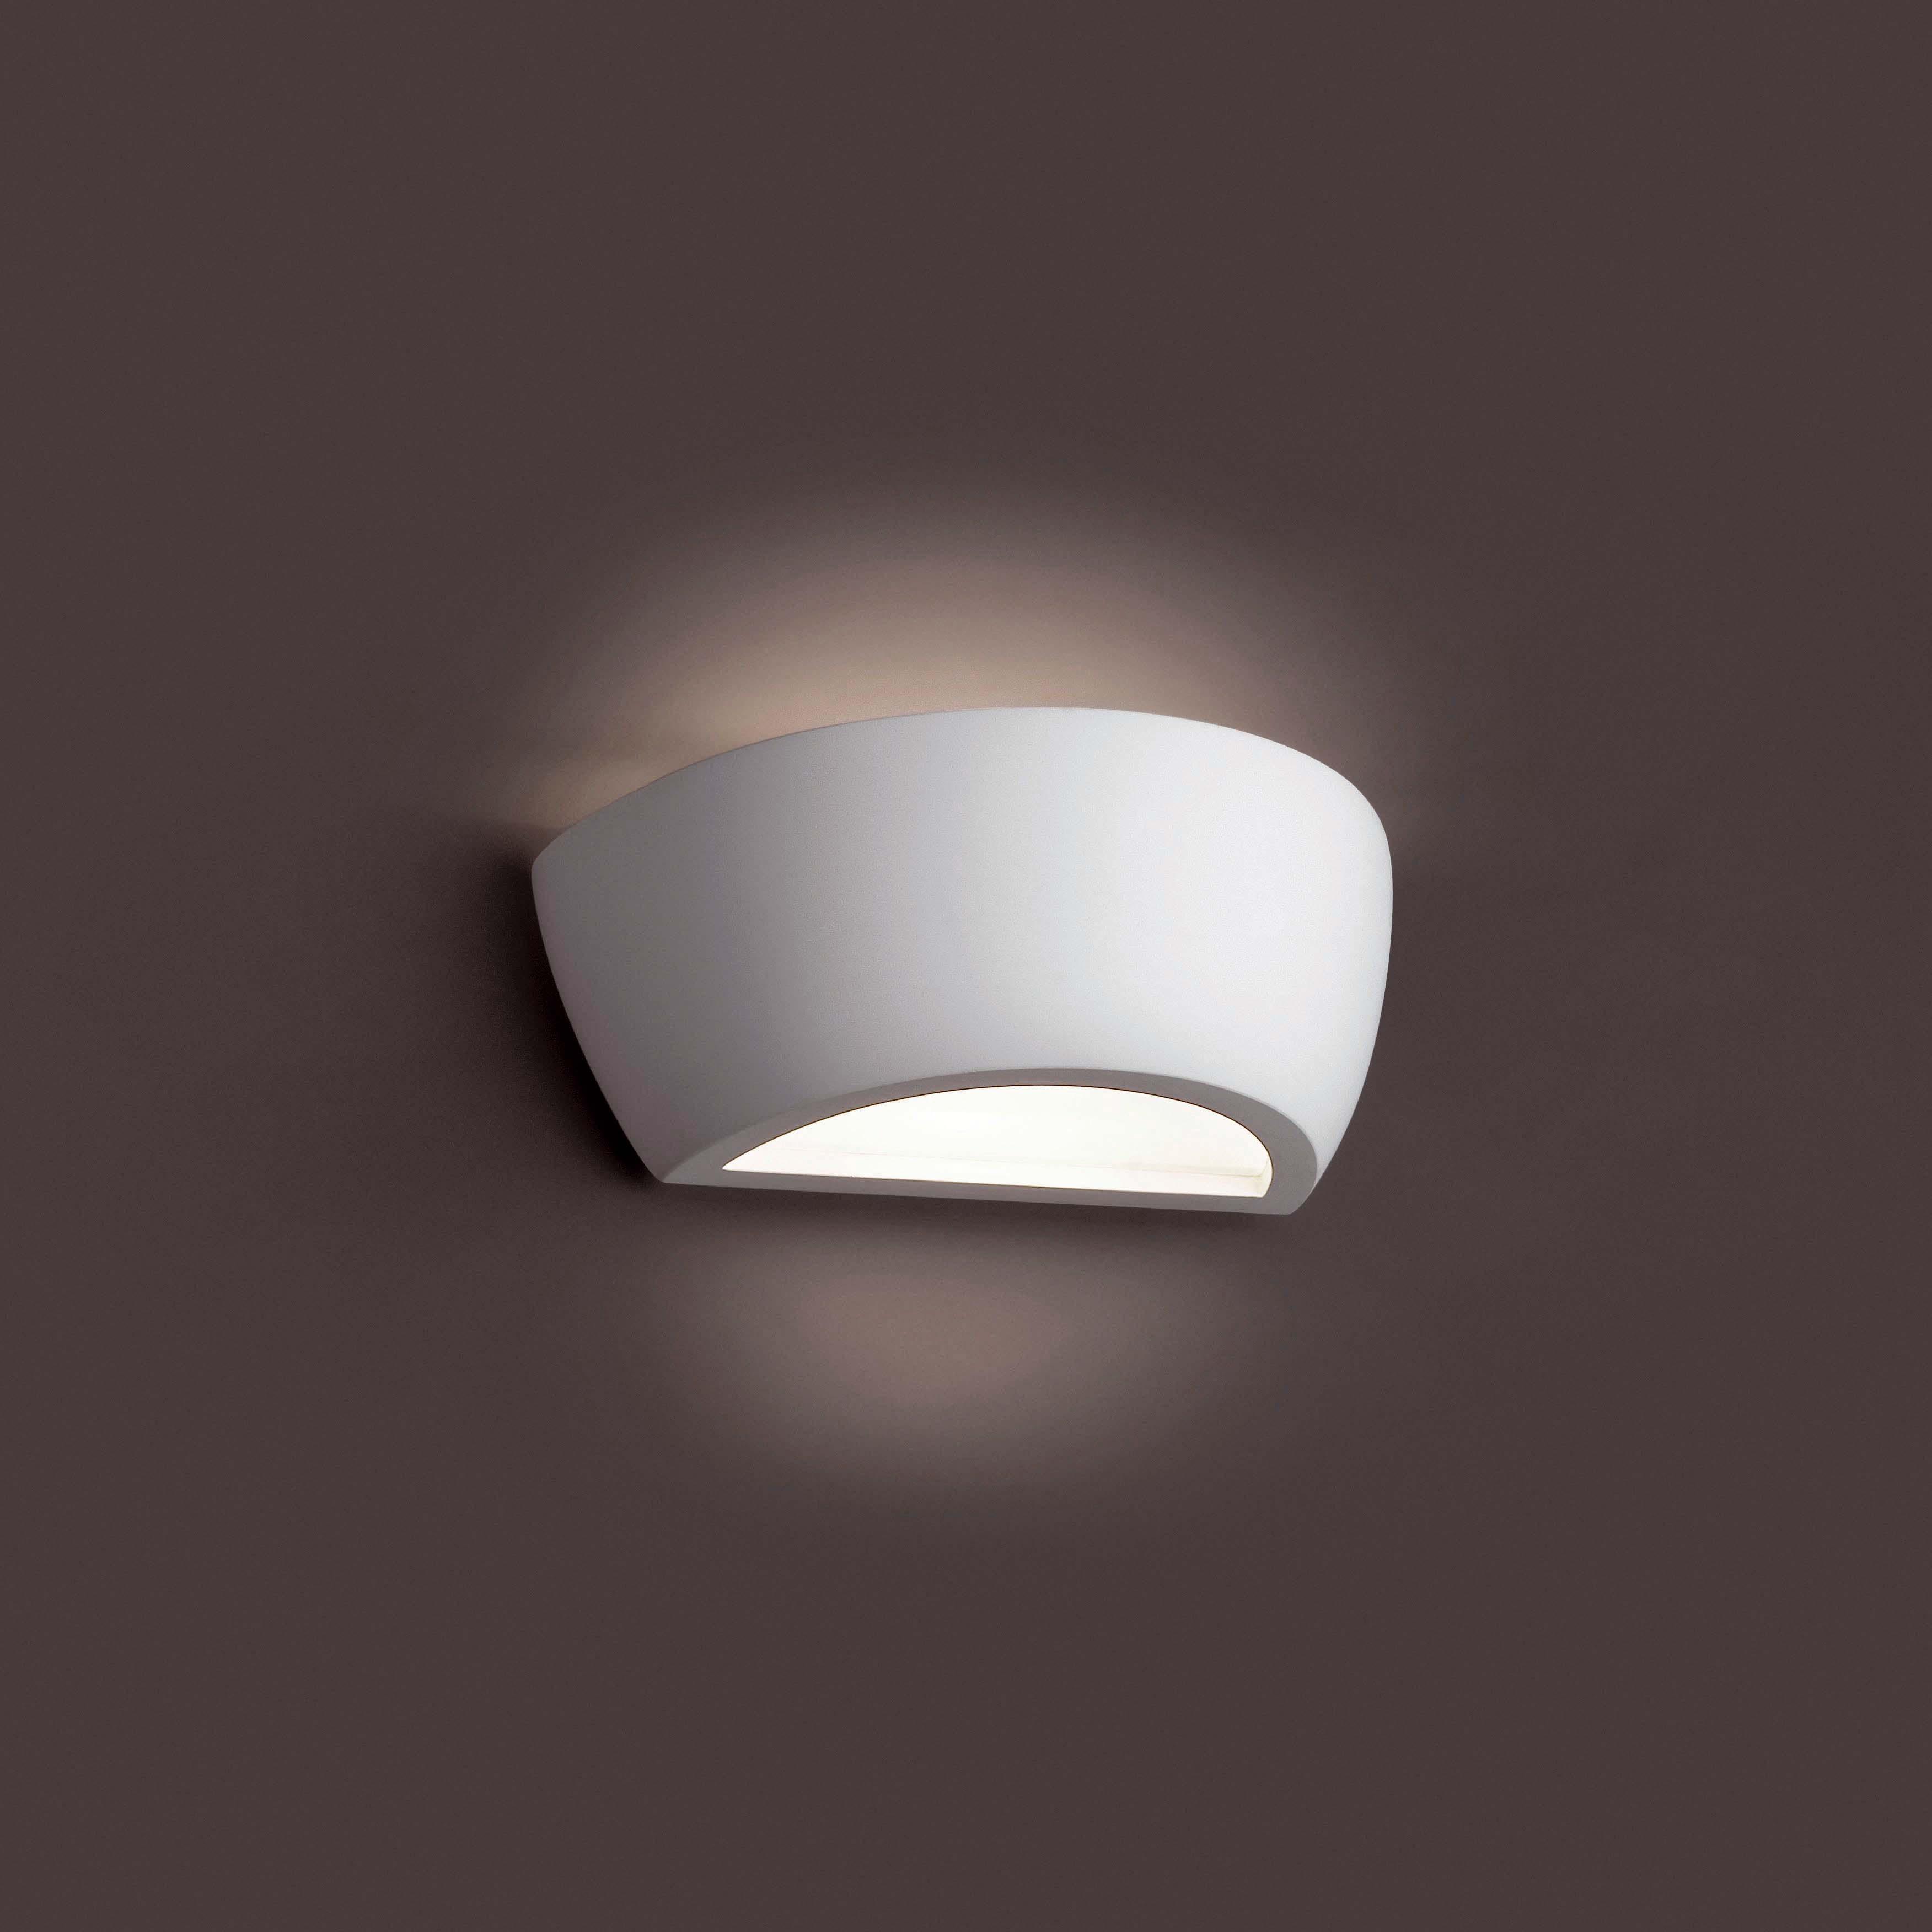 Cheras 2 Wall Lamp R7s JP78 100W White